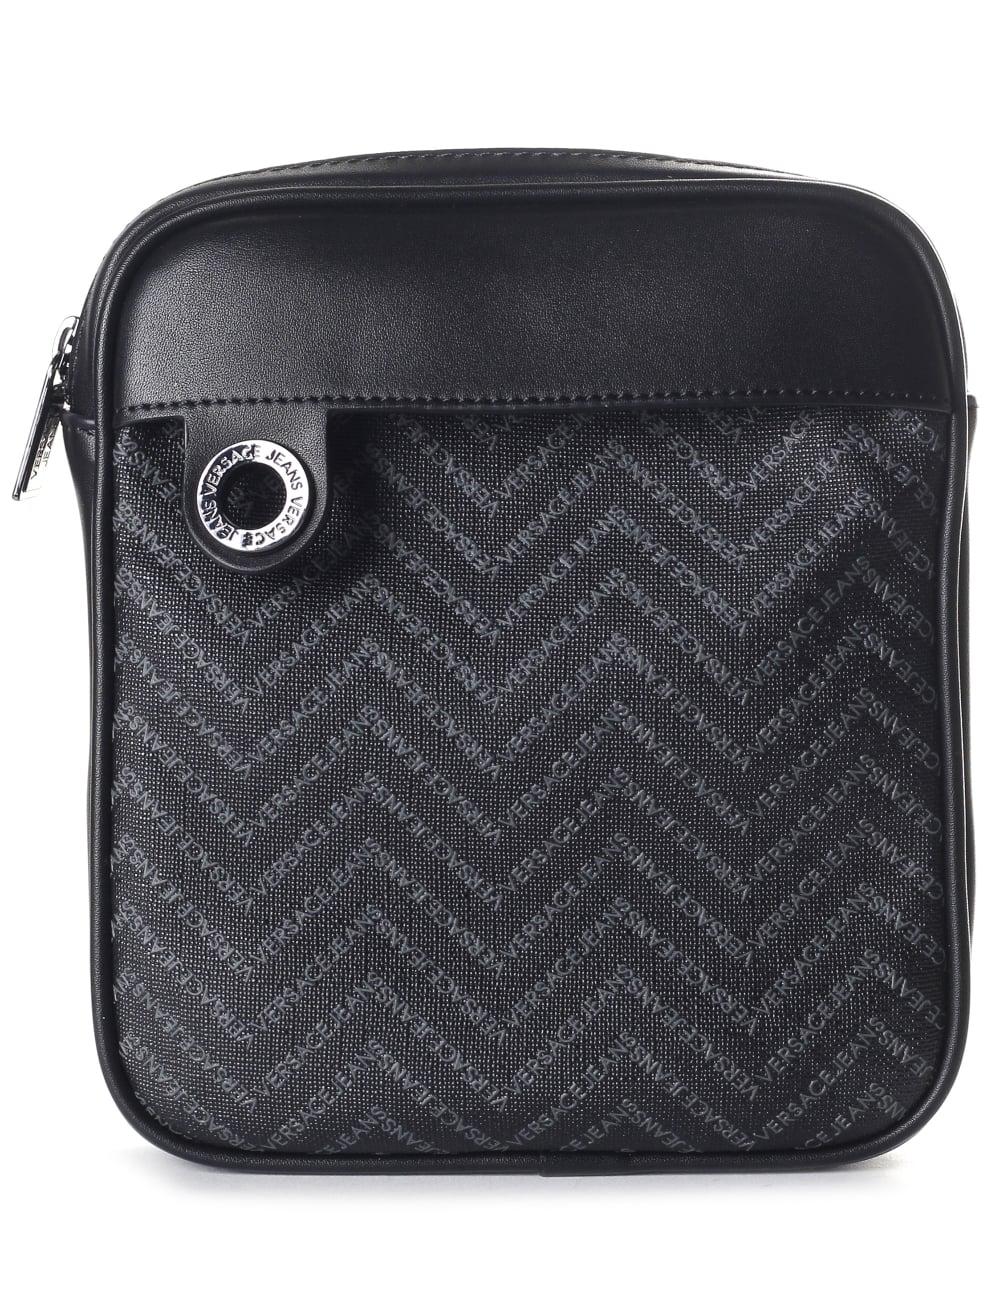 553506a2 Versace Jeans Chevron Print Men's Crossbody Bag